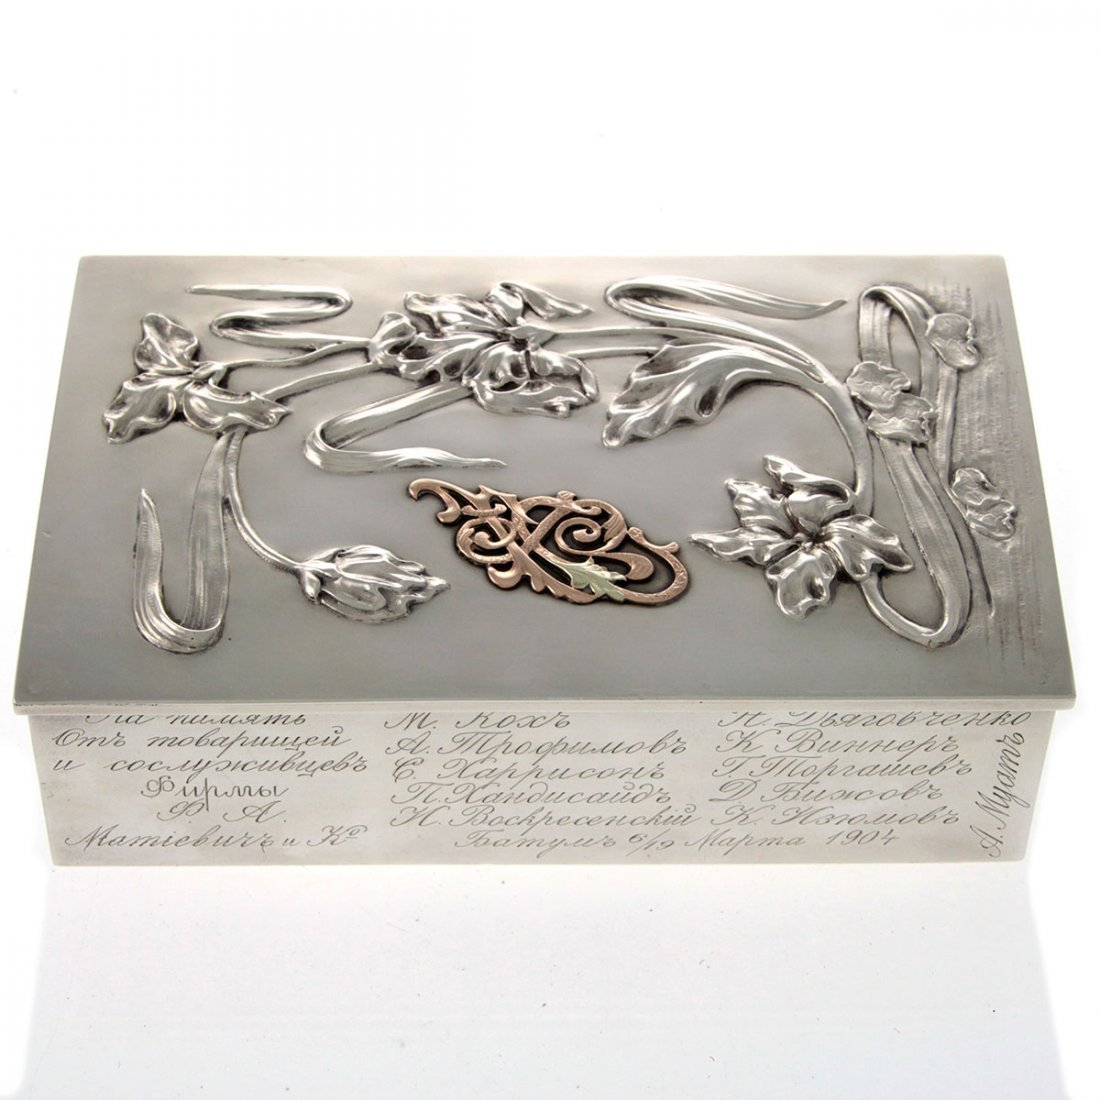 Russian Art Nouveau Silver Cigar Box, 1896-1908.